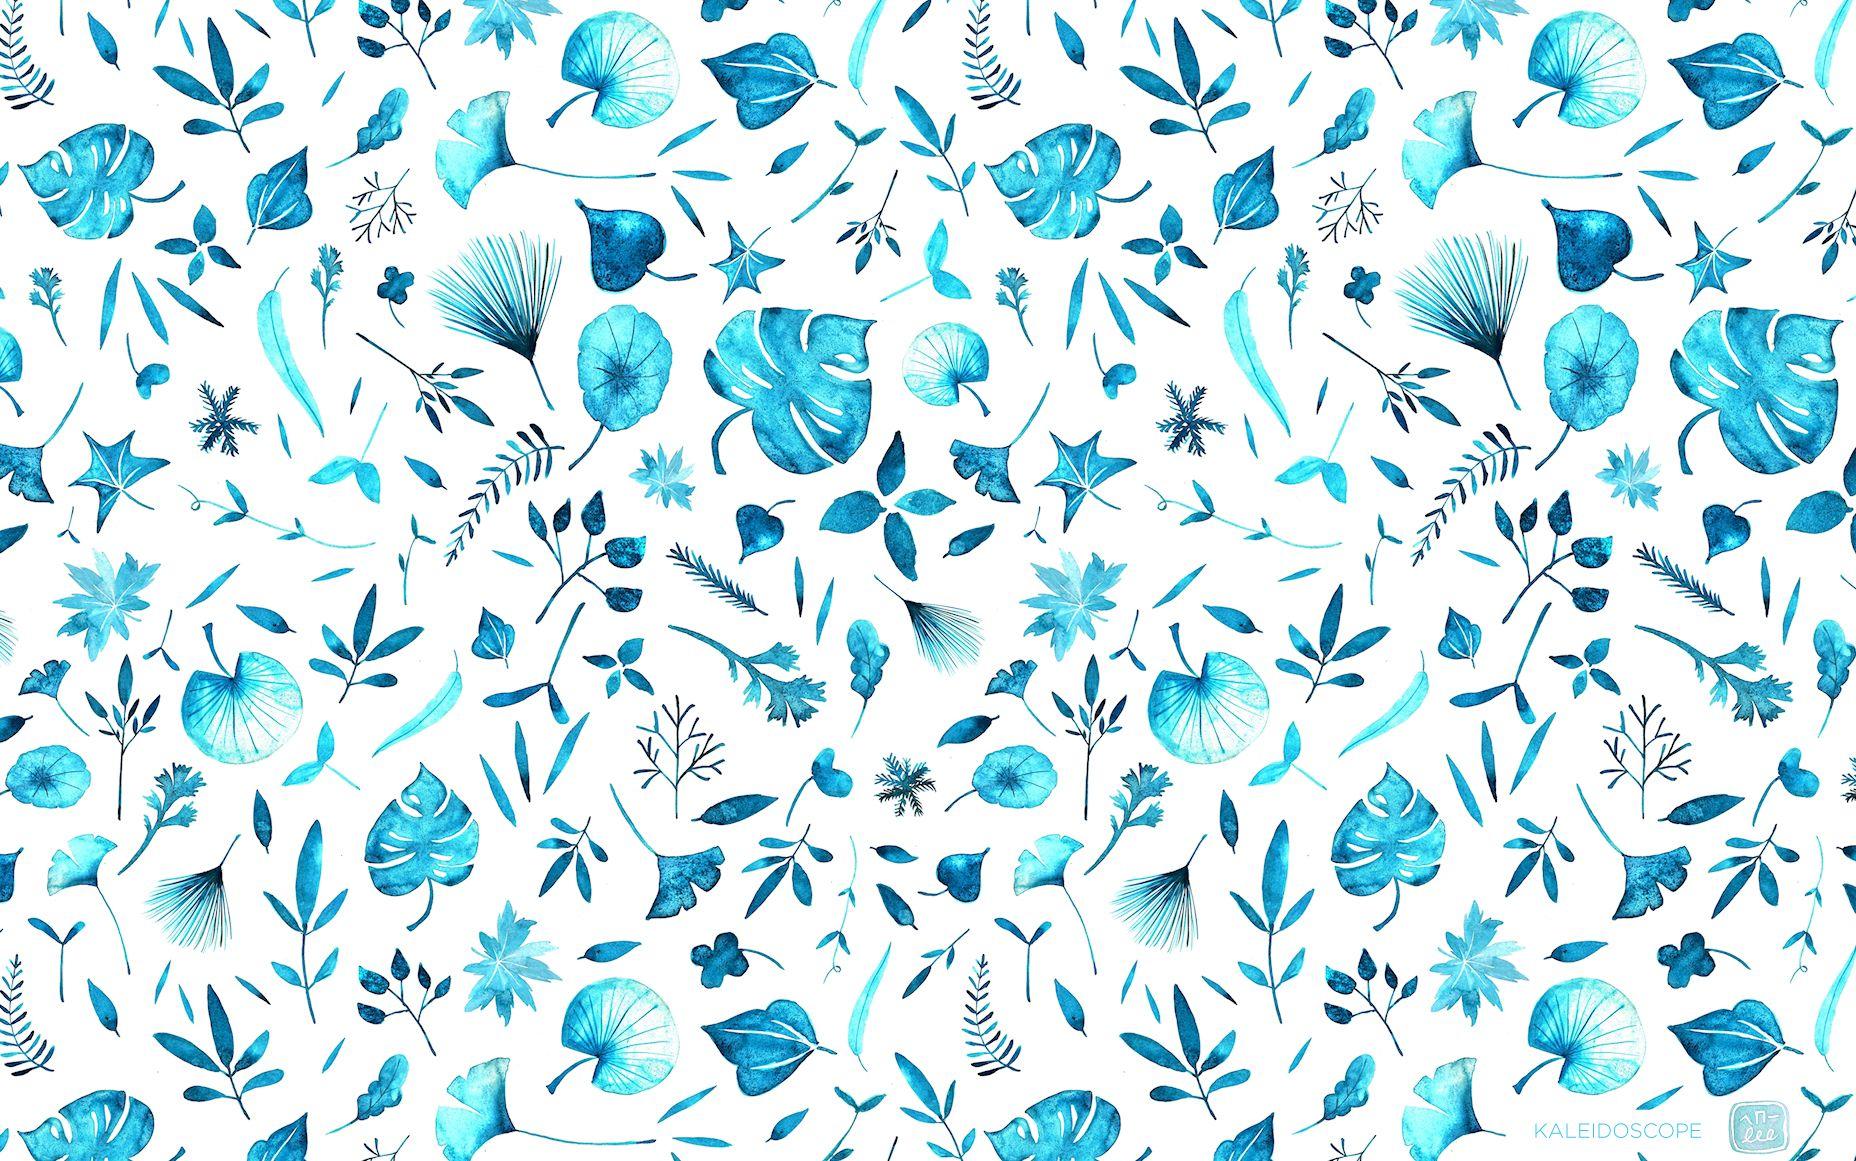 Top Wallpaper Macbook Artsy - 88d6ef25cfc73c24942286906817b220  Picture_924322.jpg